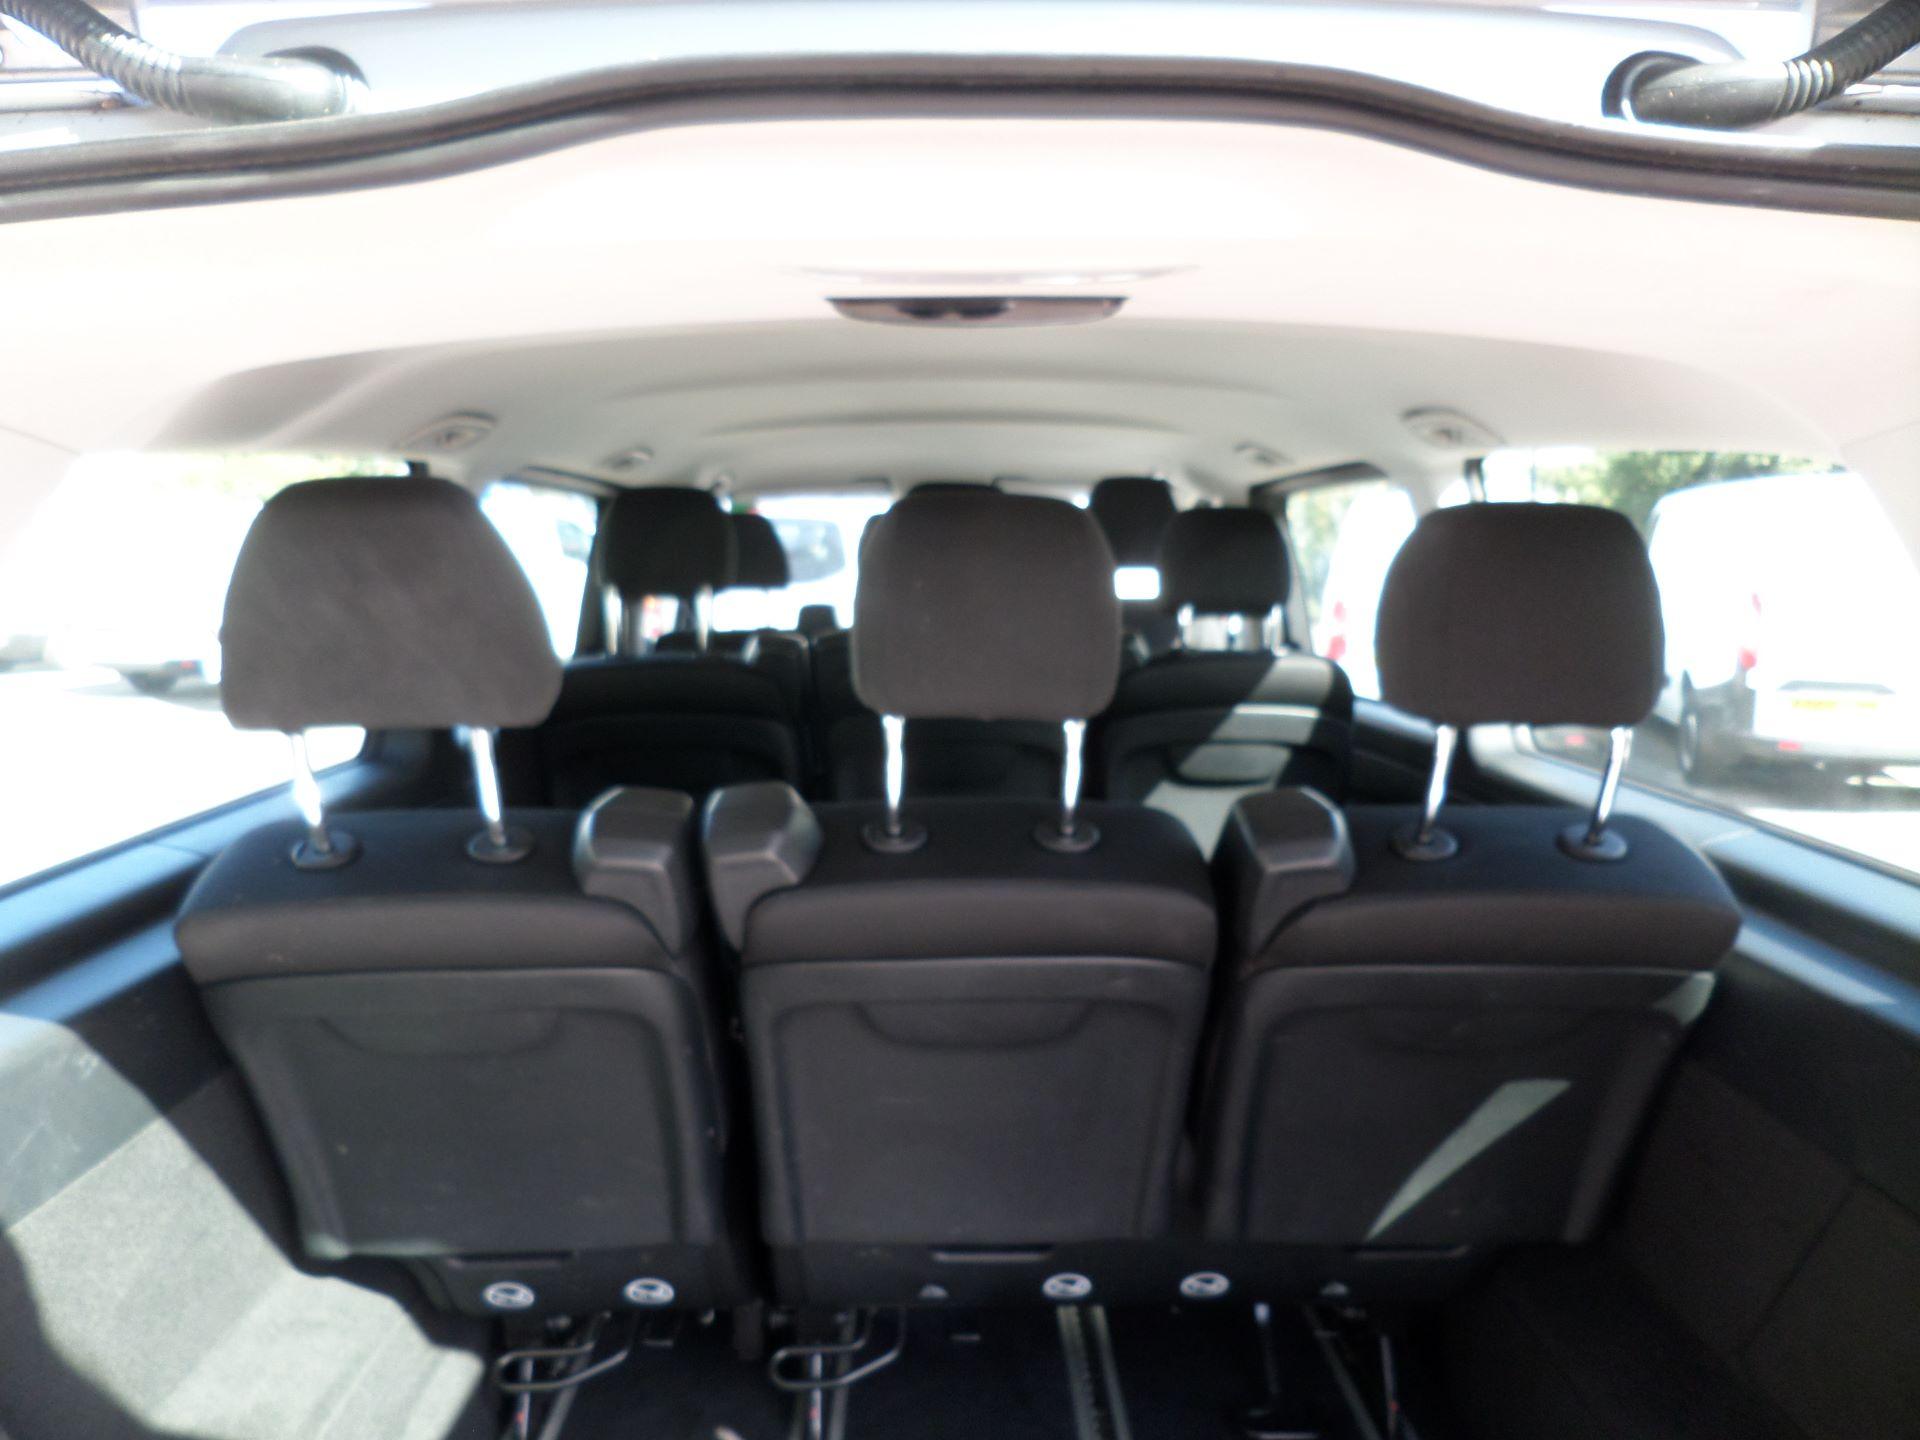 2019 Mercedes-Benz Vito 119 Bluetec Select 9-Seater 7G-Tronic Euro 6 (KR19XWW) Image 6